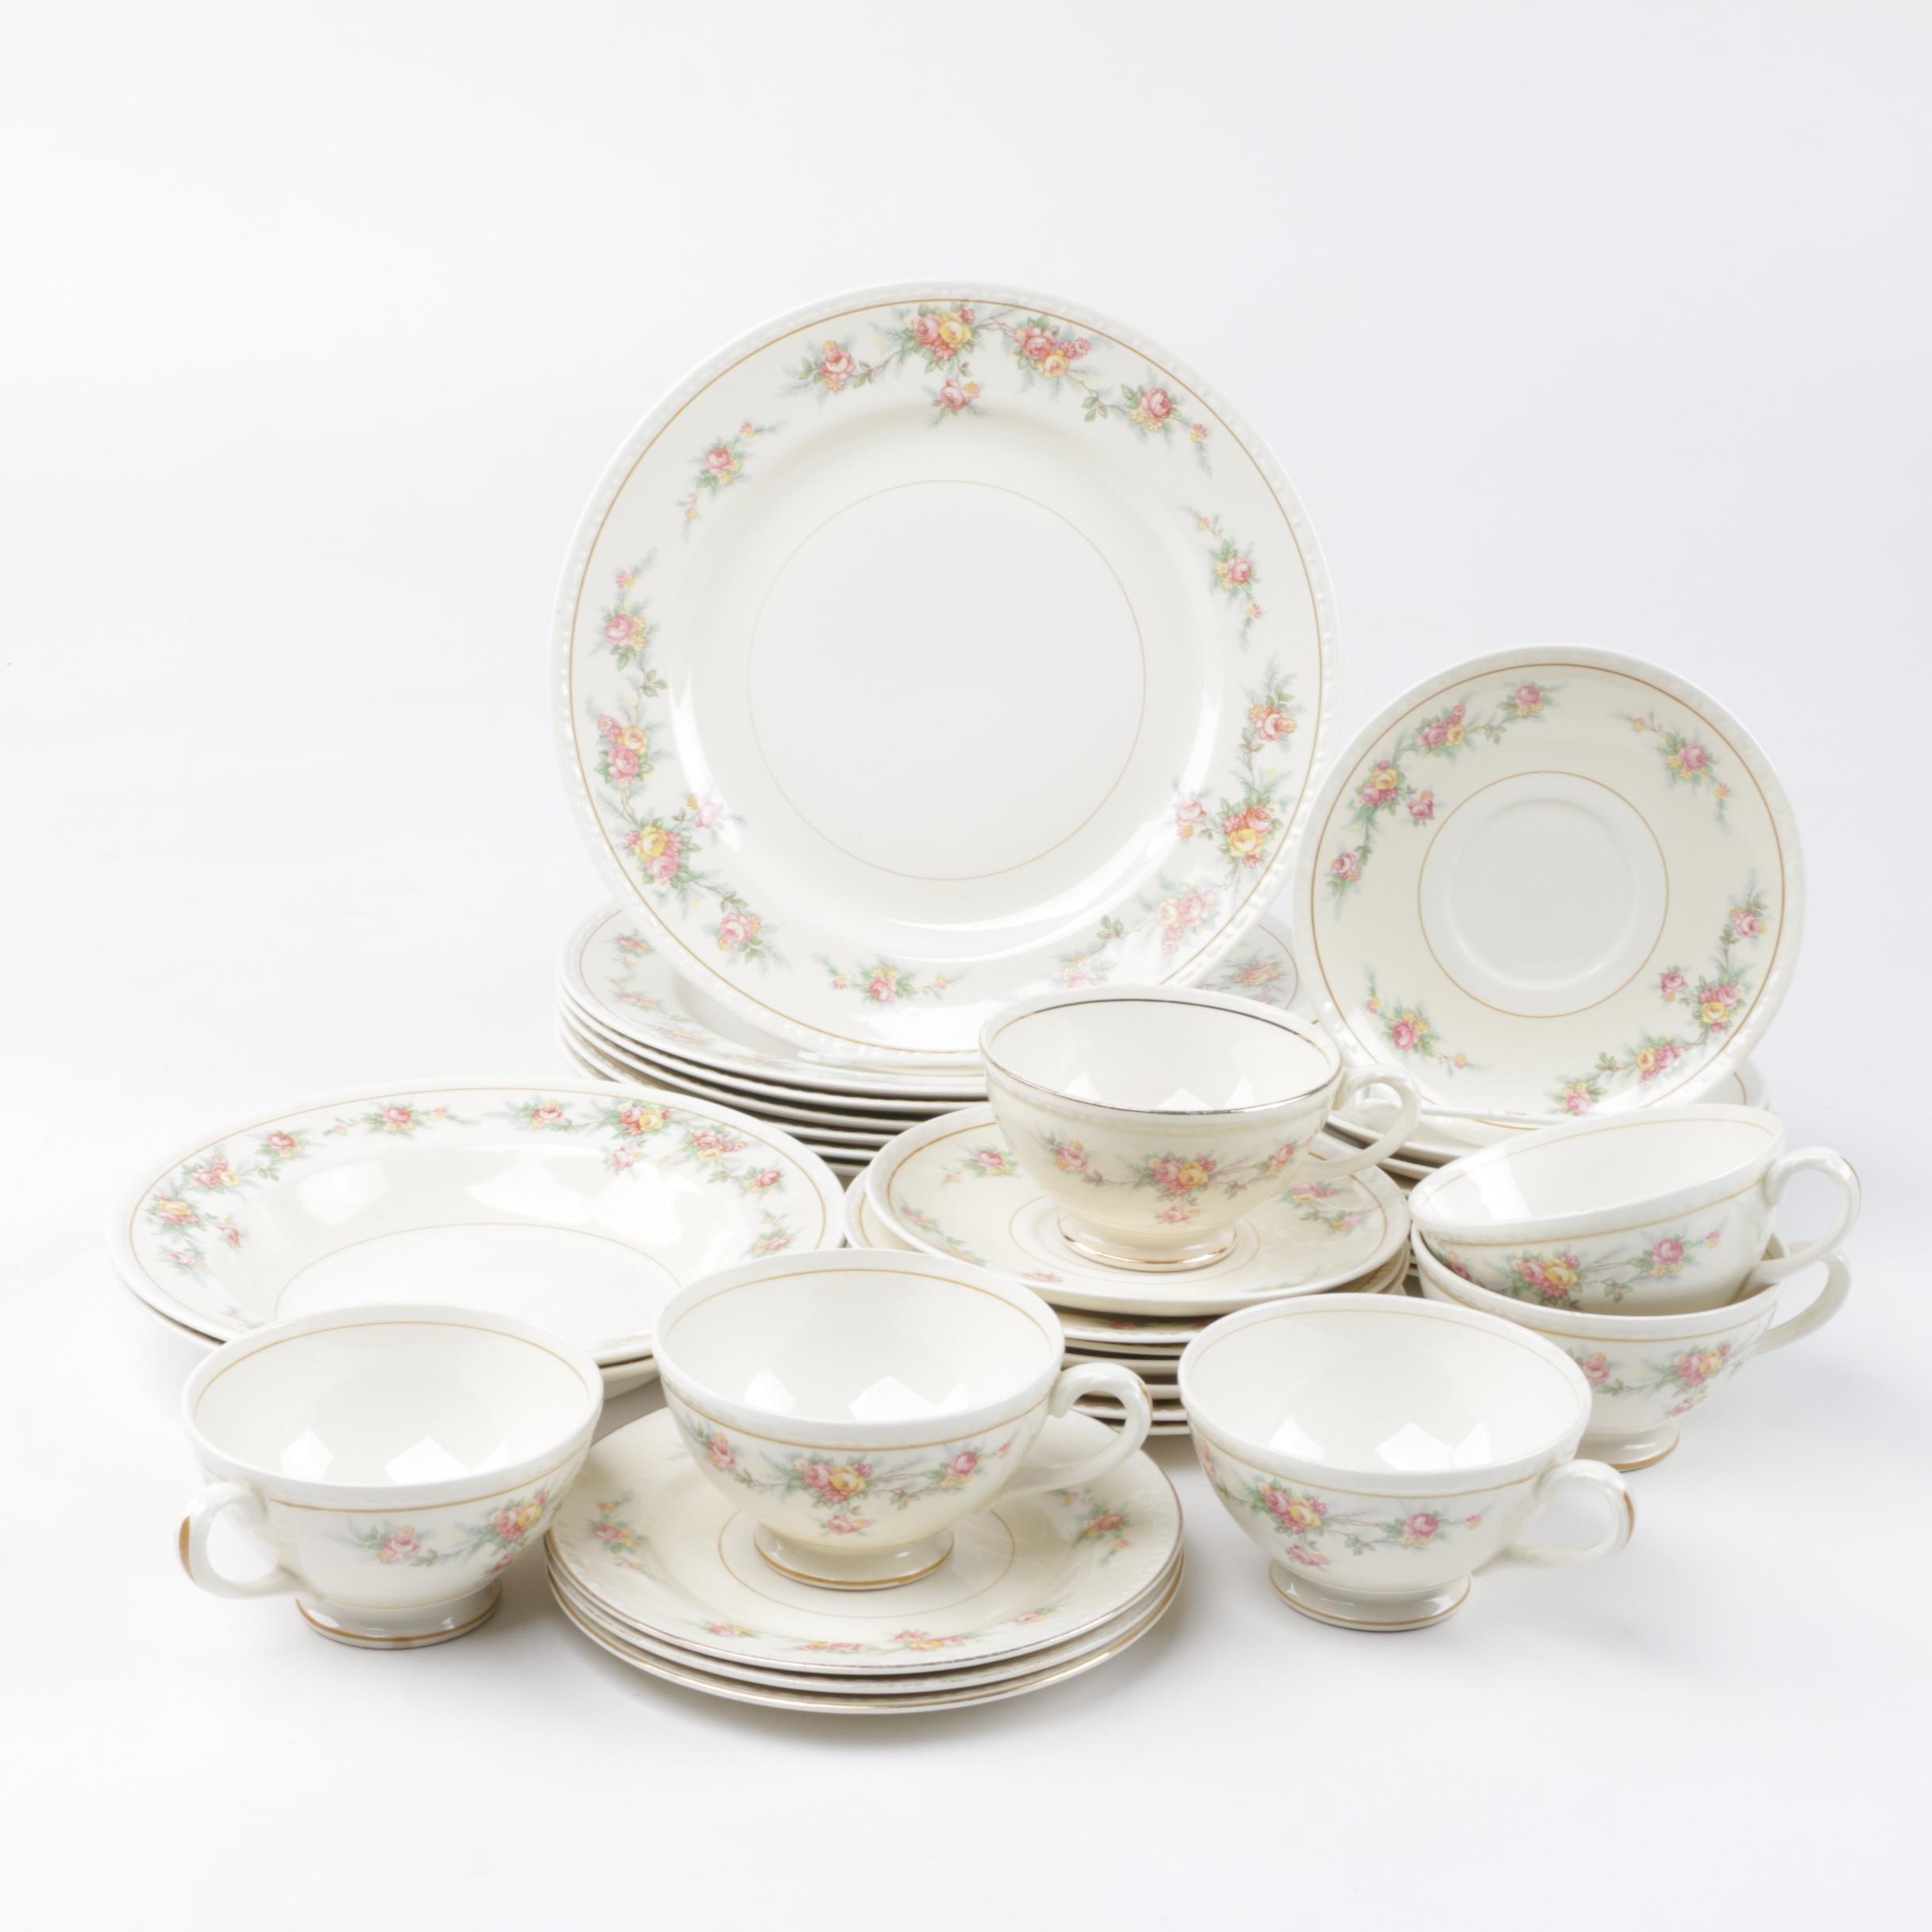 1942 Homer Laughlin Tableware